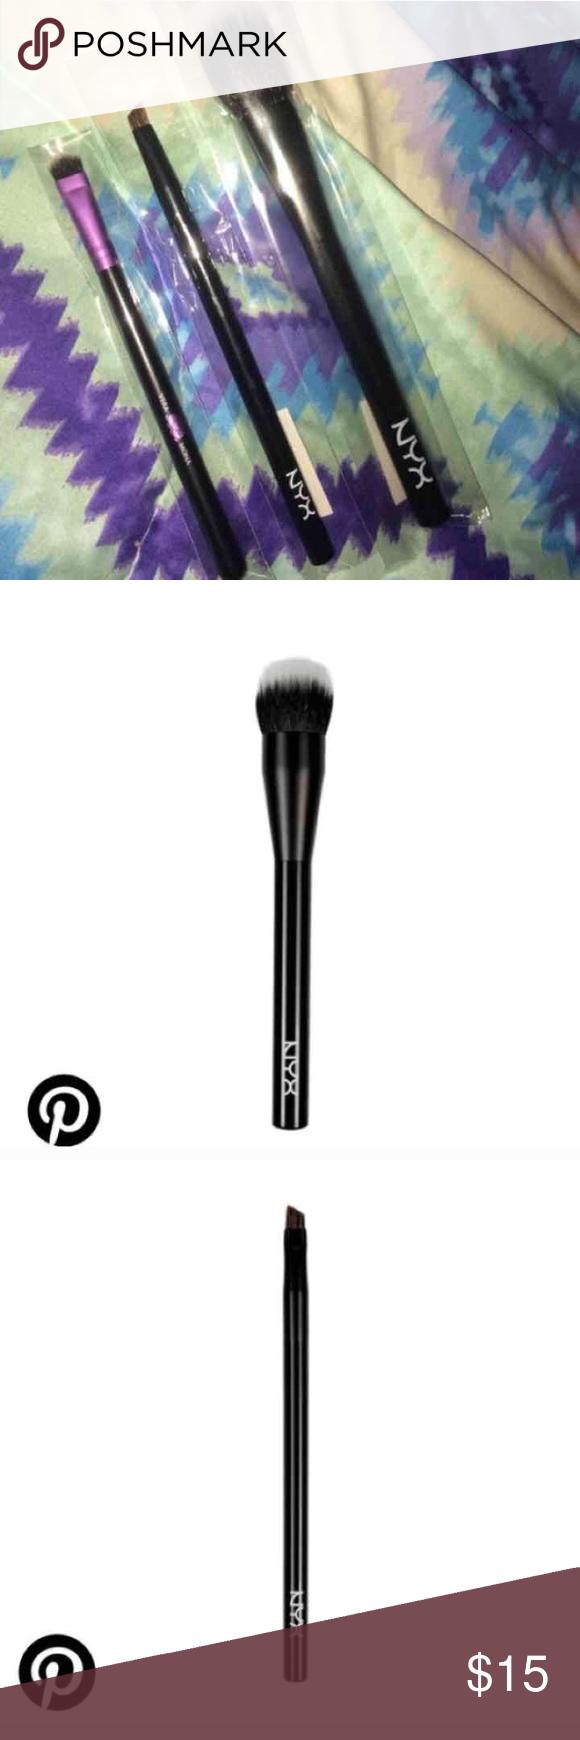 Brush bundle 1 NYX Pro Dual Fiber foundation brush ($19), 1 NYX Pro Angled Brush ($9) and 1 Vera Mona small blending brush($9). New in package. No trades Makeup Brushes & Tools